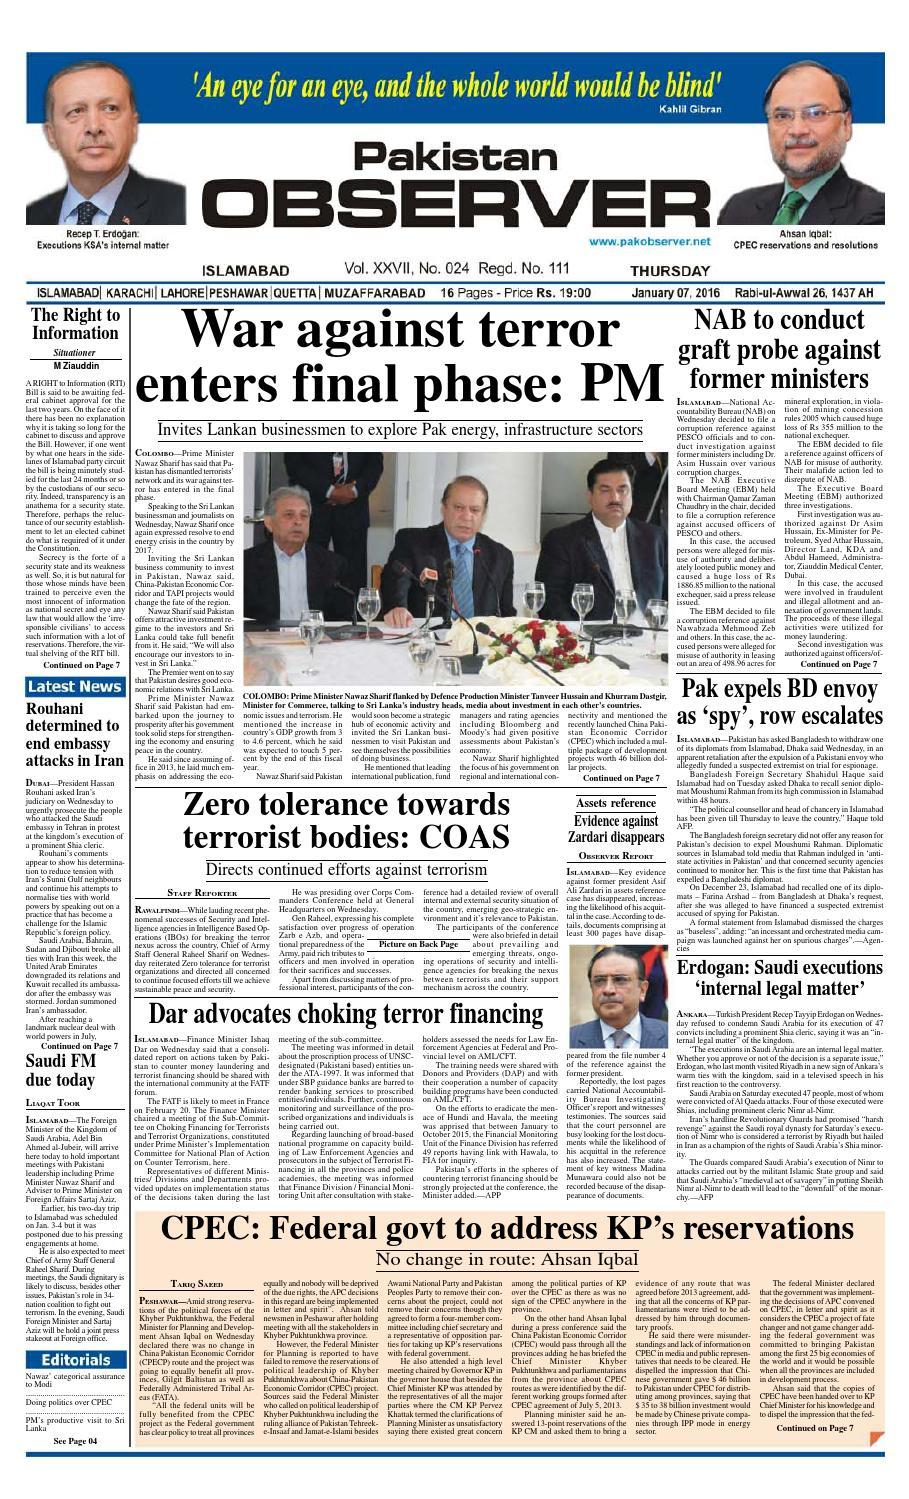 Ep2016jan07 By Pakistan Observer Issuu Kabel Rca 3 Ke Male Kitani Sj0039